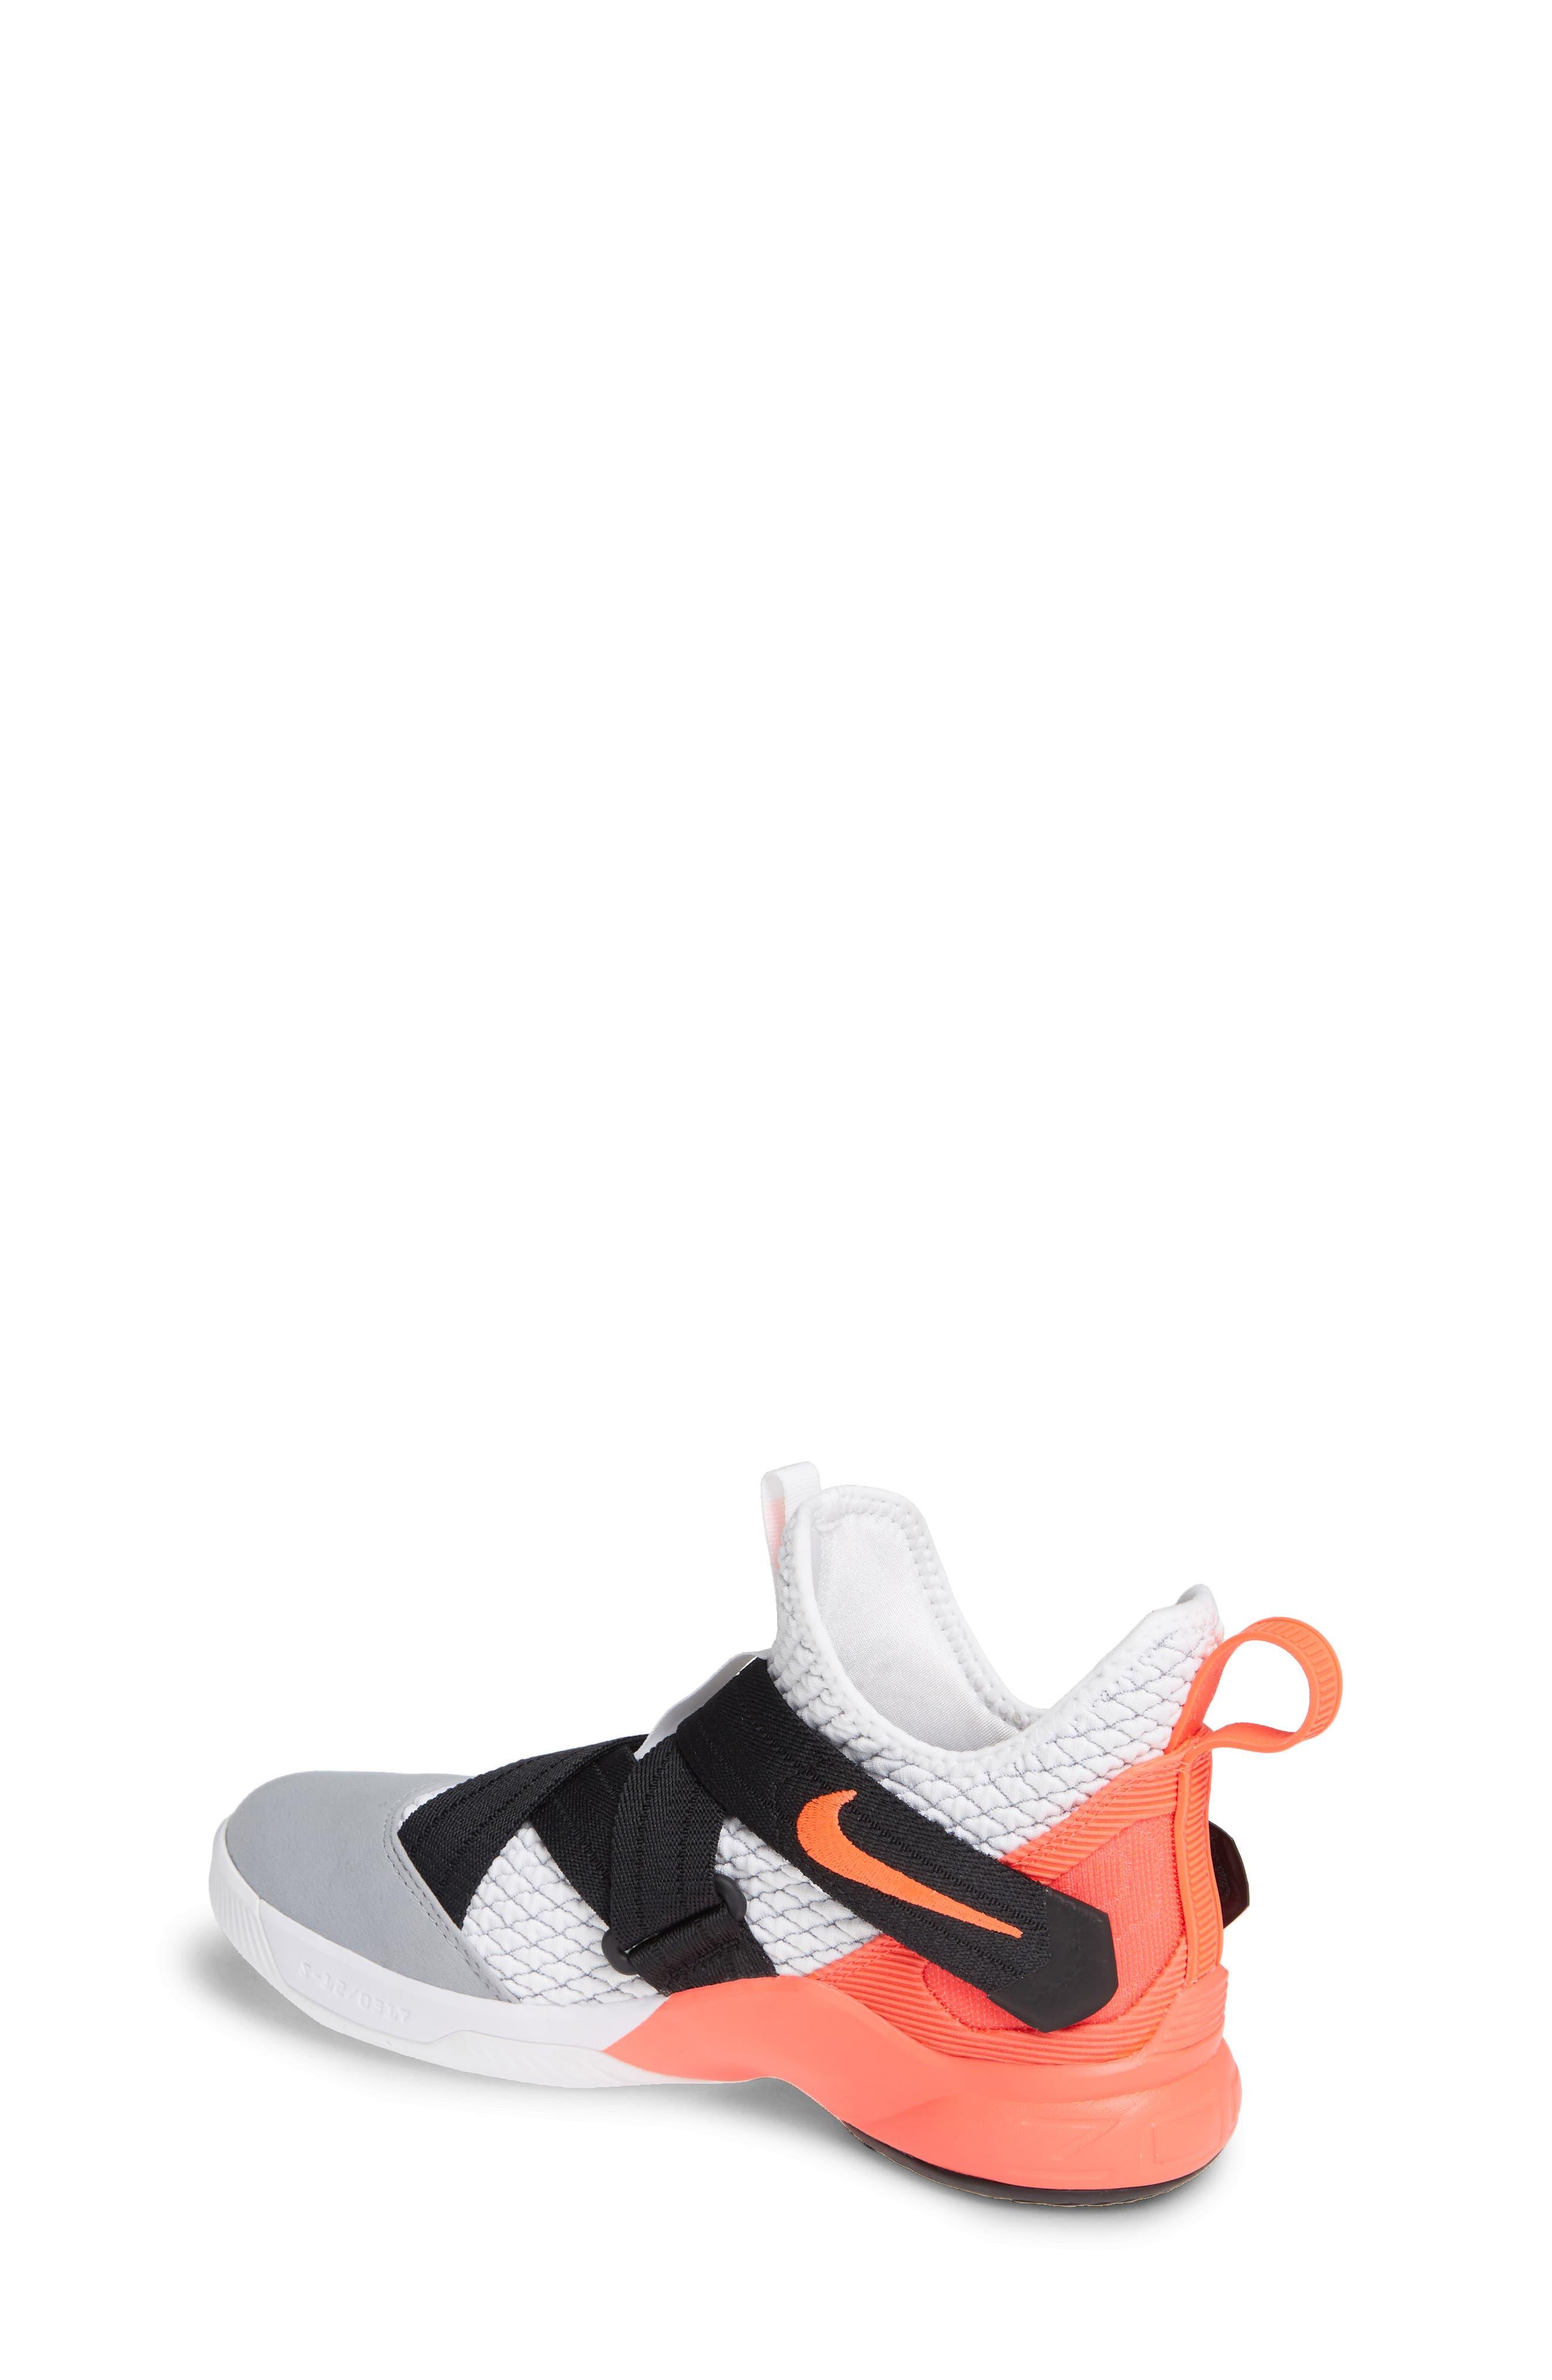 LeBron Soldier XII SFG Basketball Shoe,                             Alternate thumbnail 2, color,                             WHITE/ DARK GREY CRIMSON